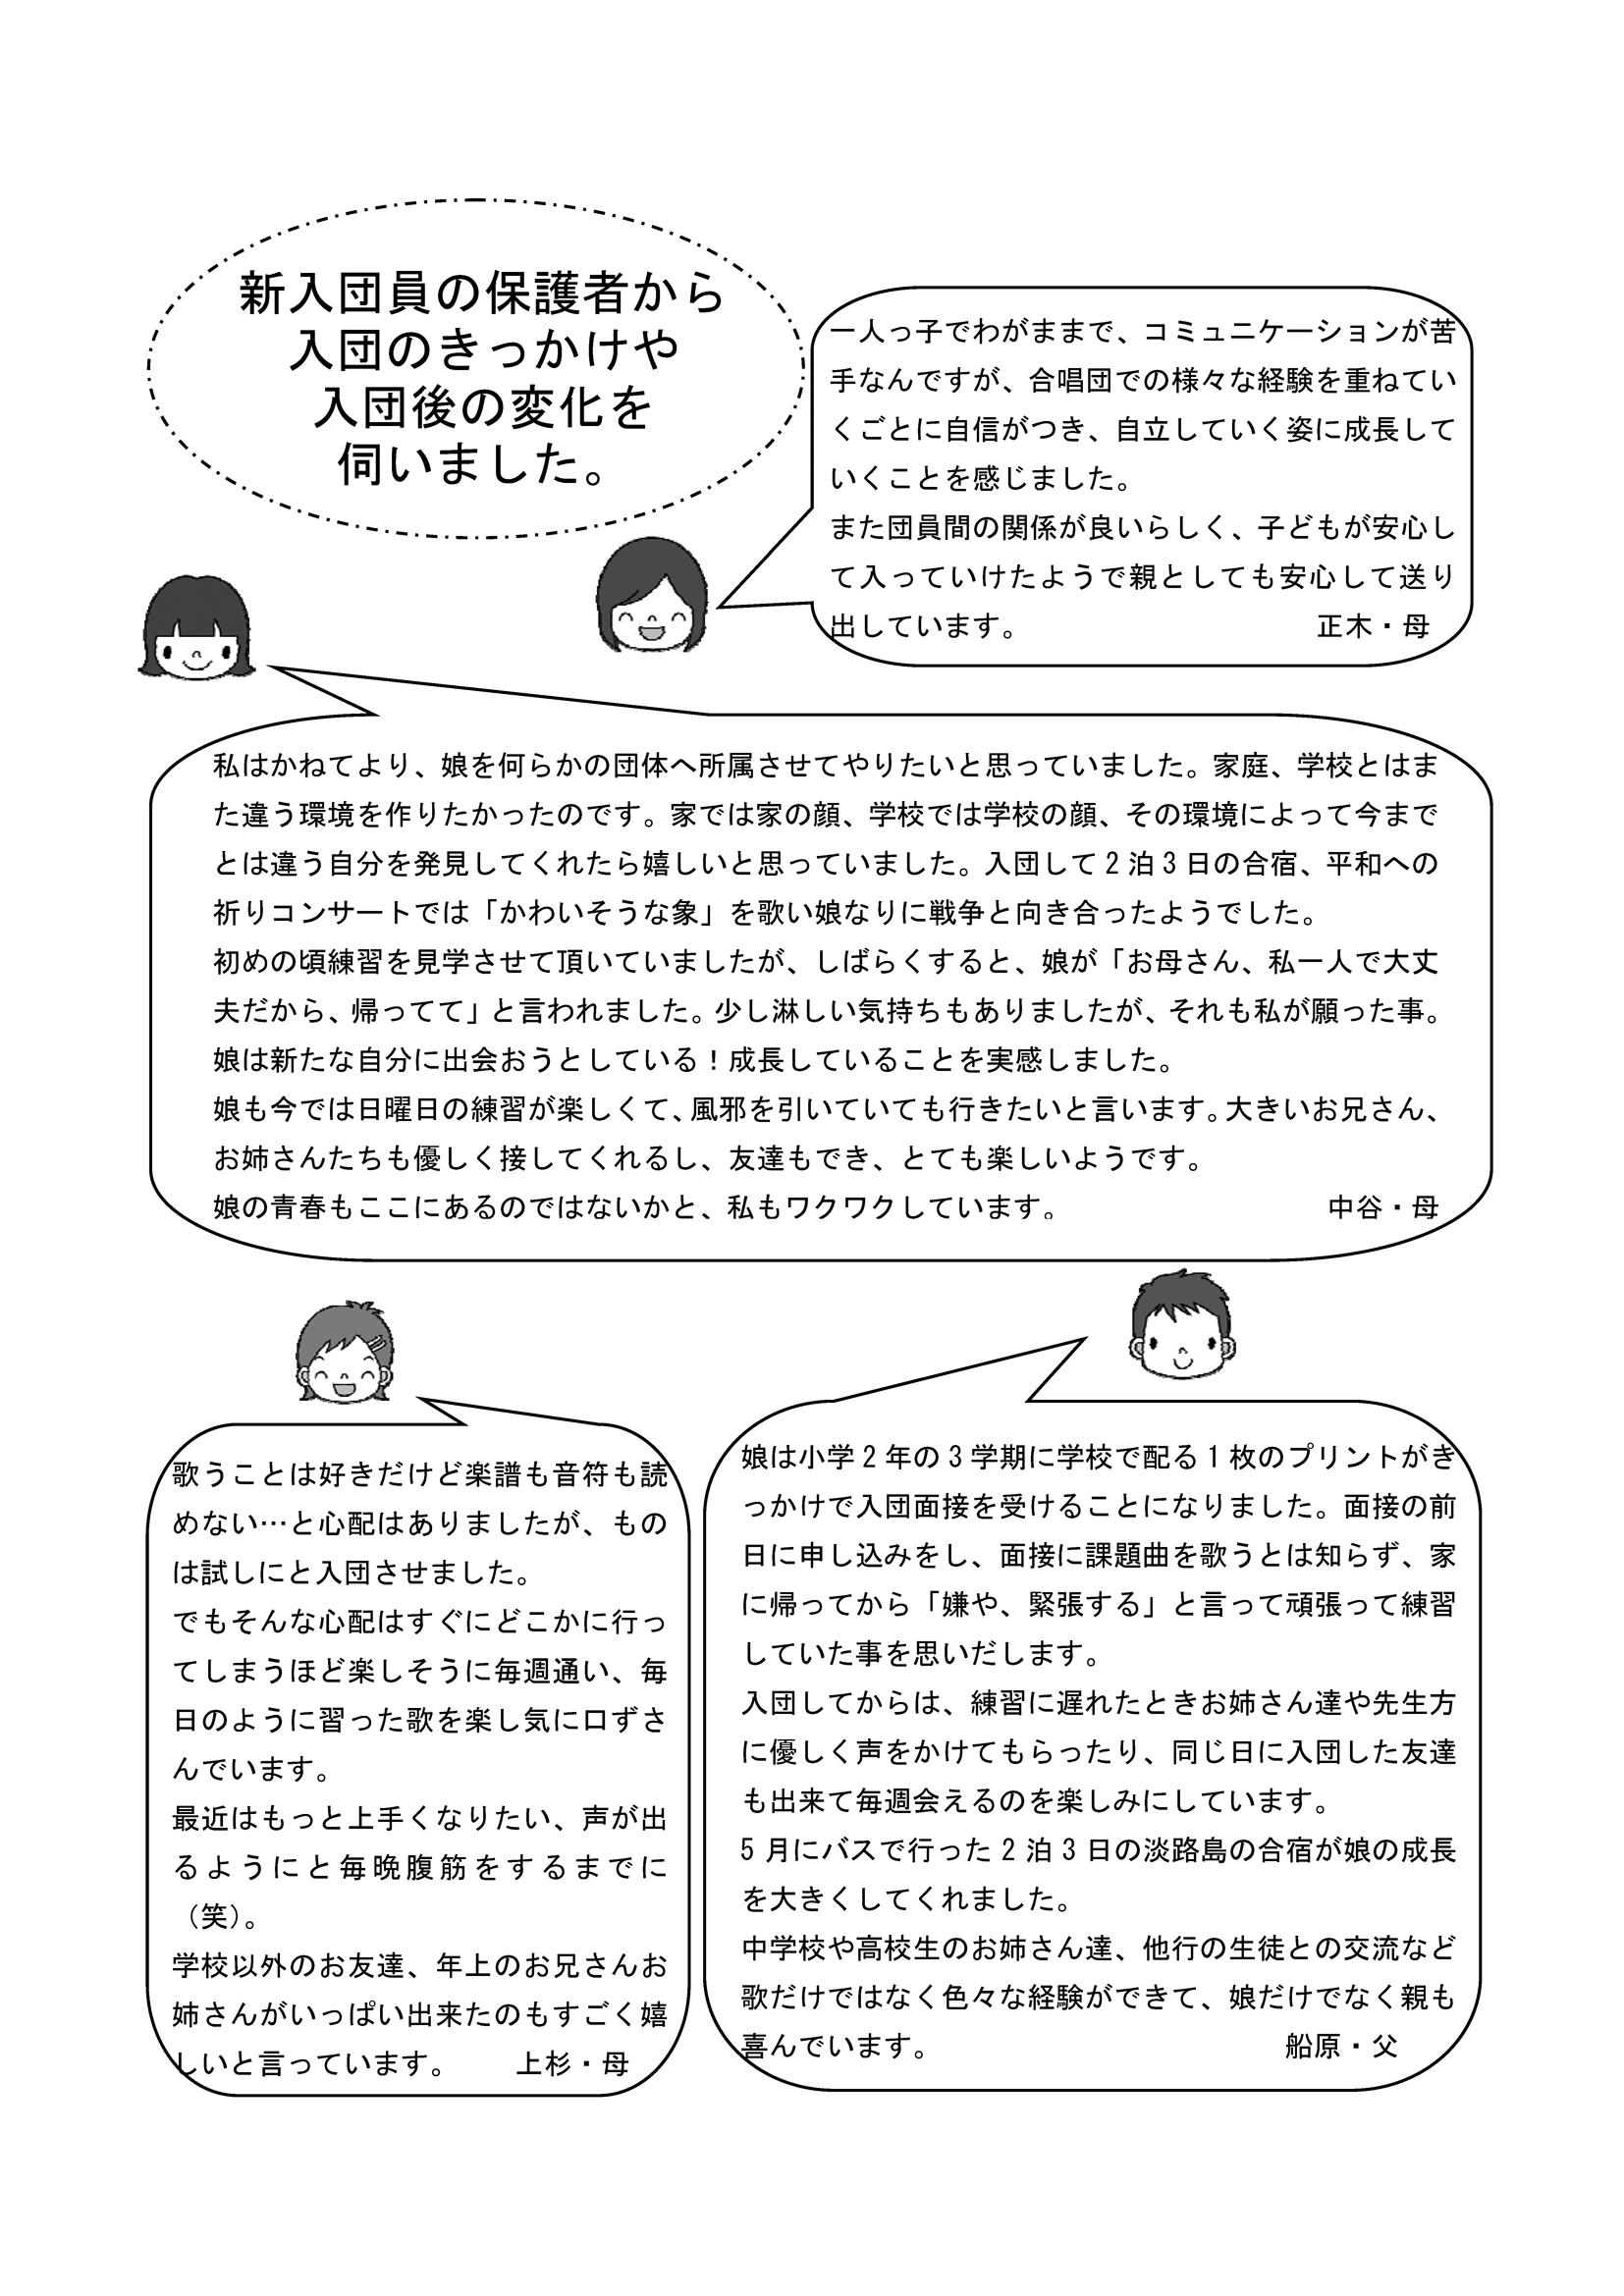 bosyuu_comment